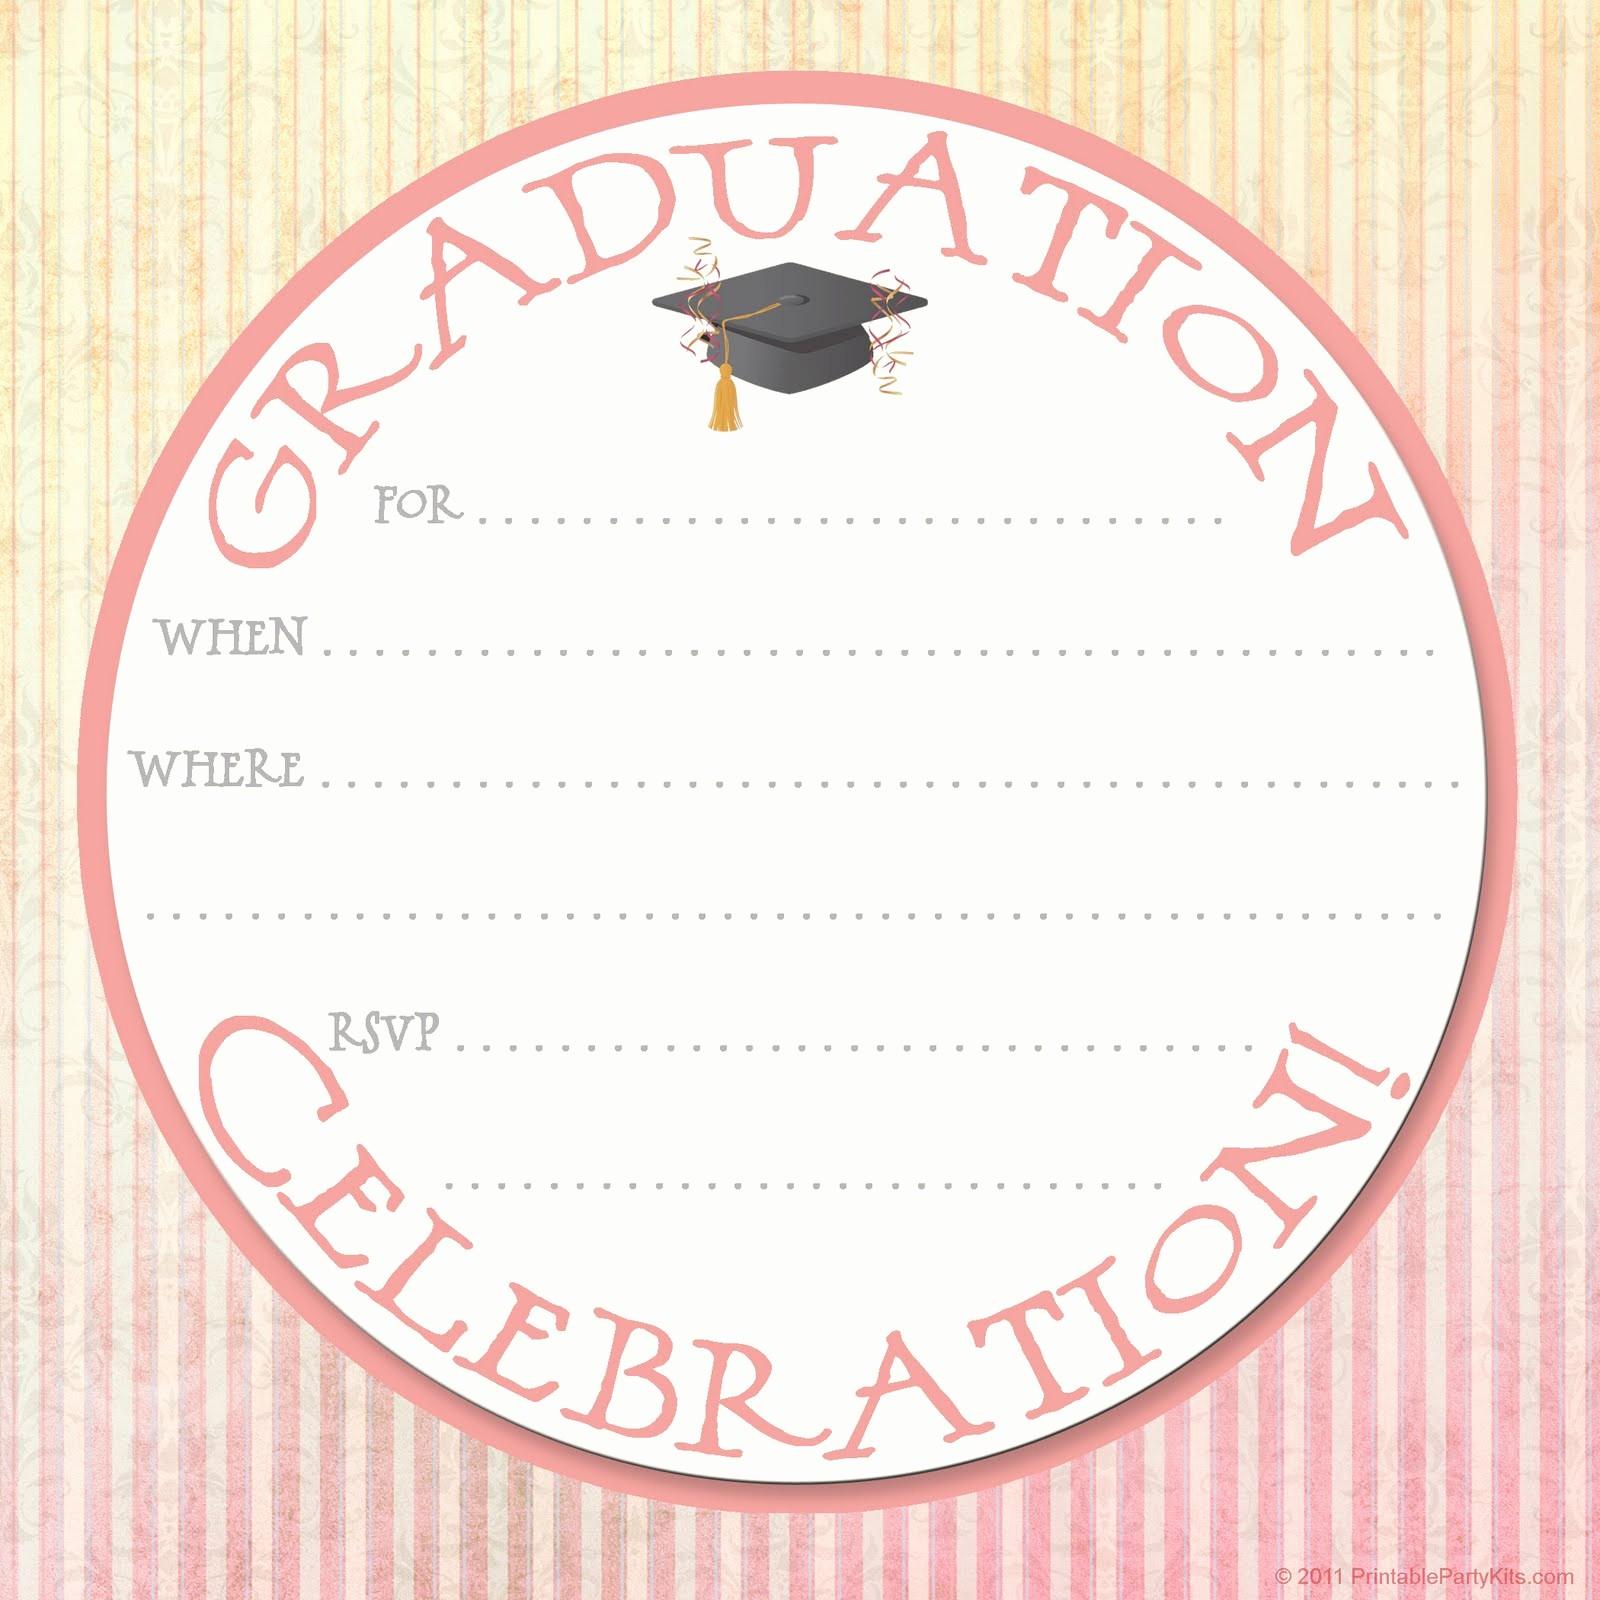 Free Graduation Party Invitation Templates Fresh Free Printable Party Invitations Graduation Party